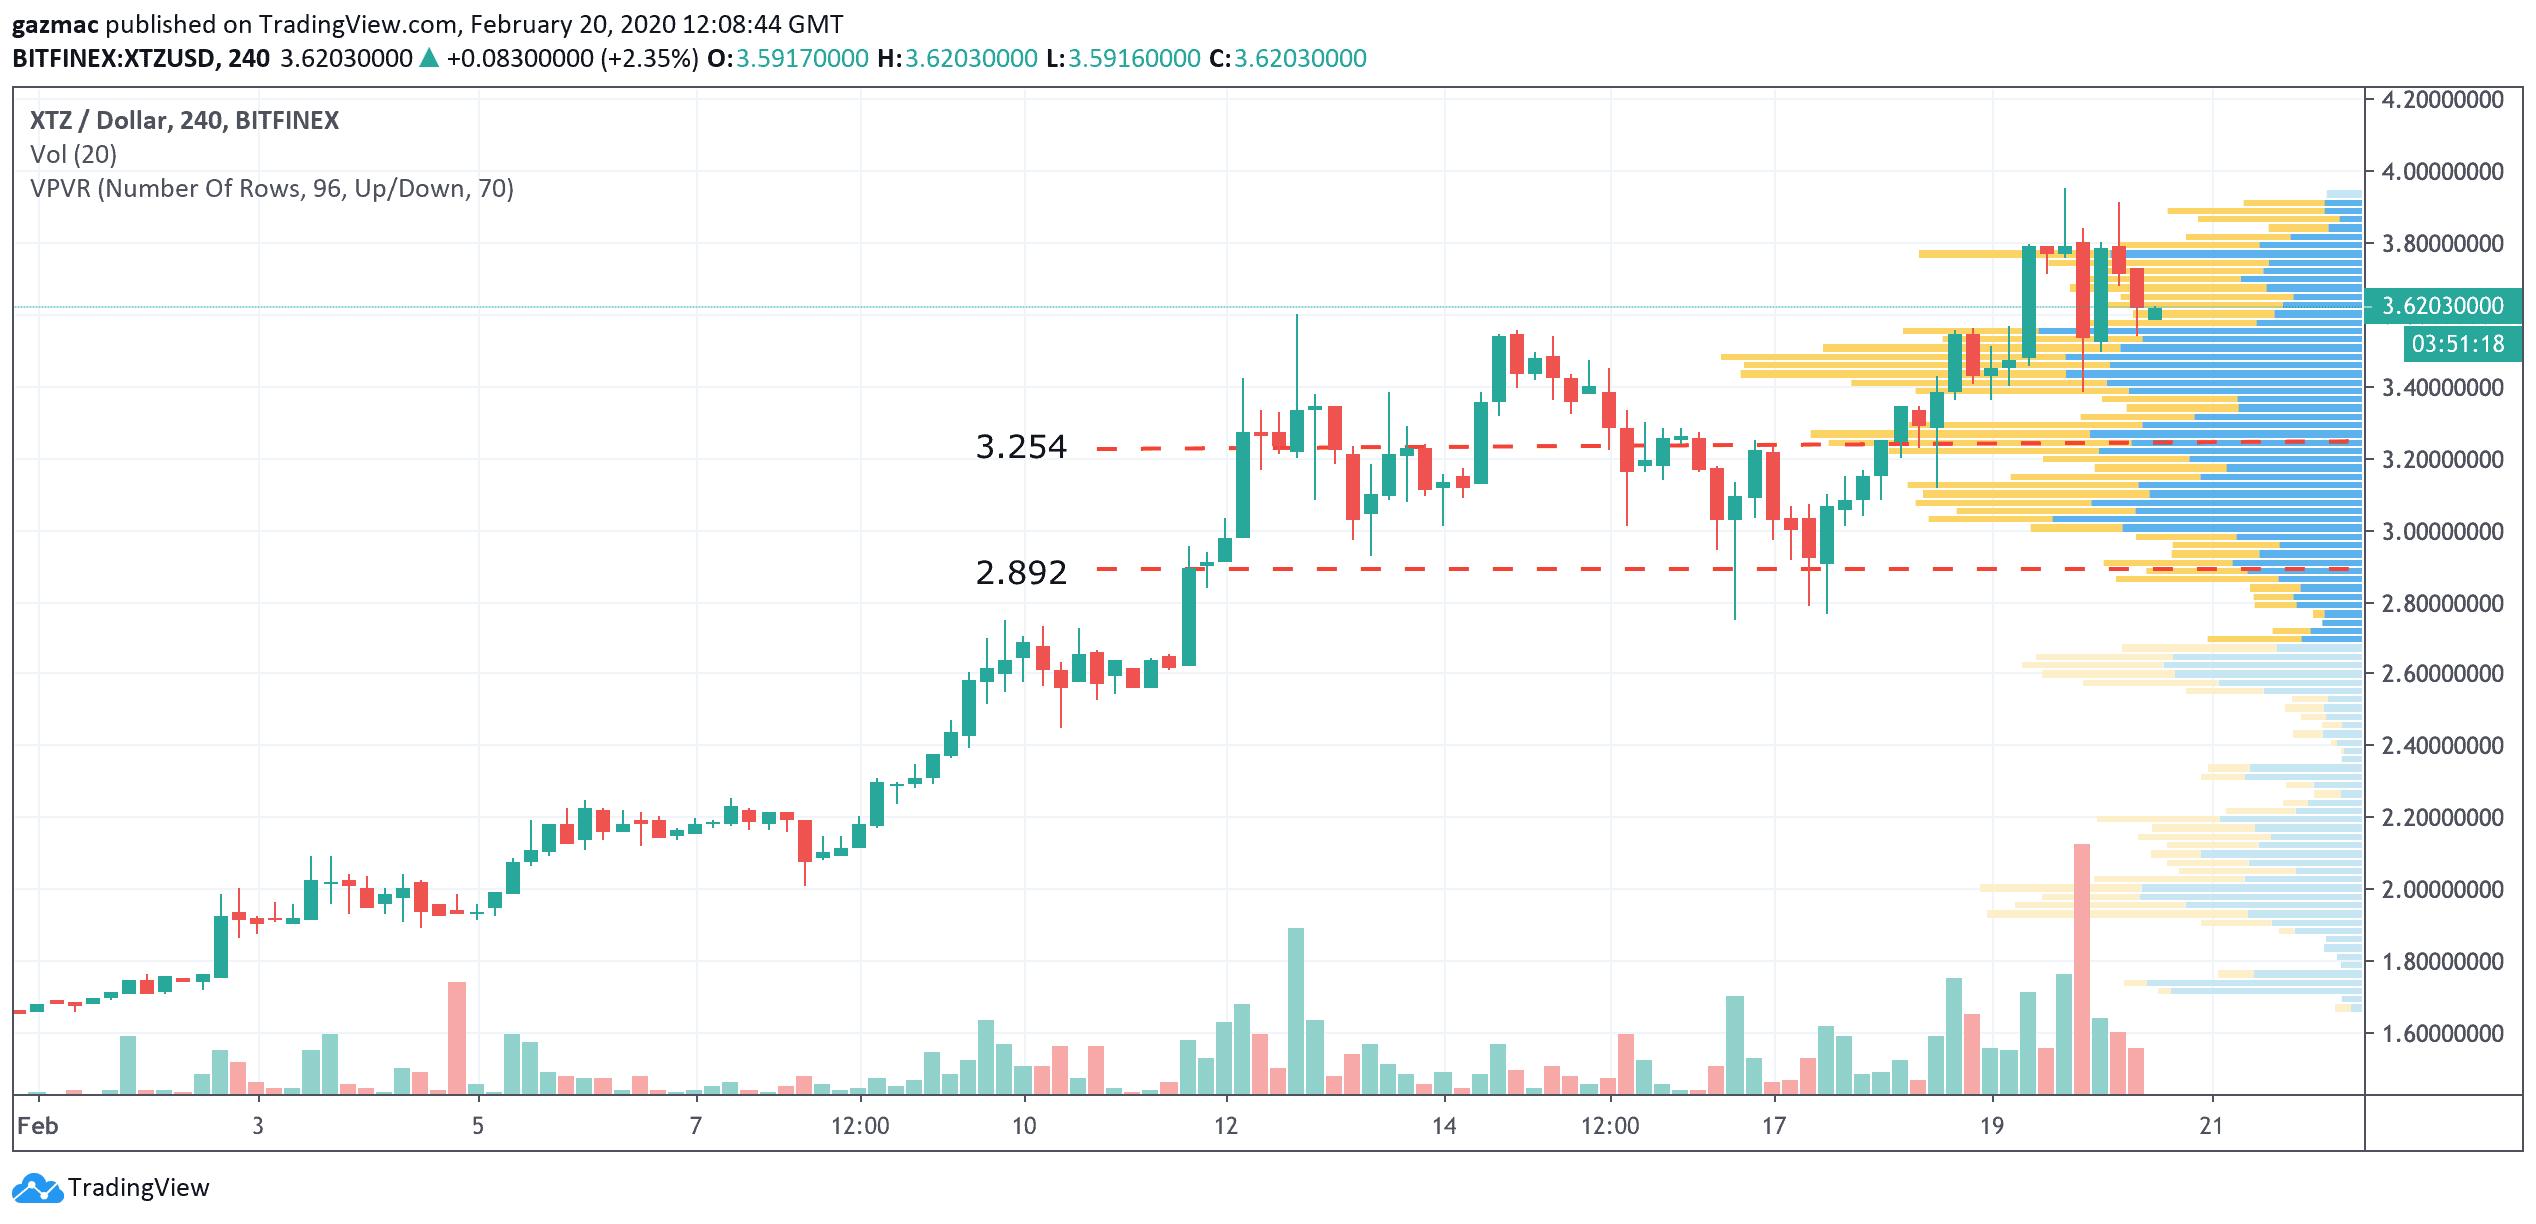 Tezos (XTZ) price chart